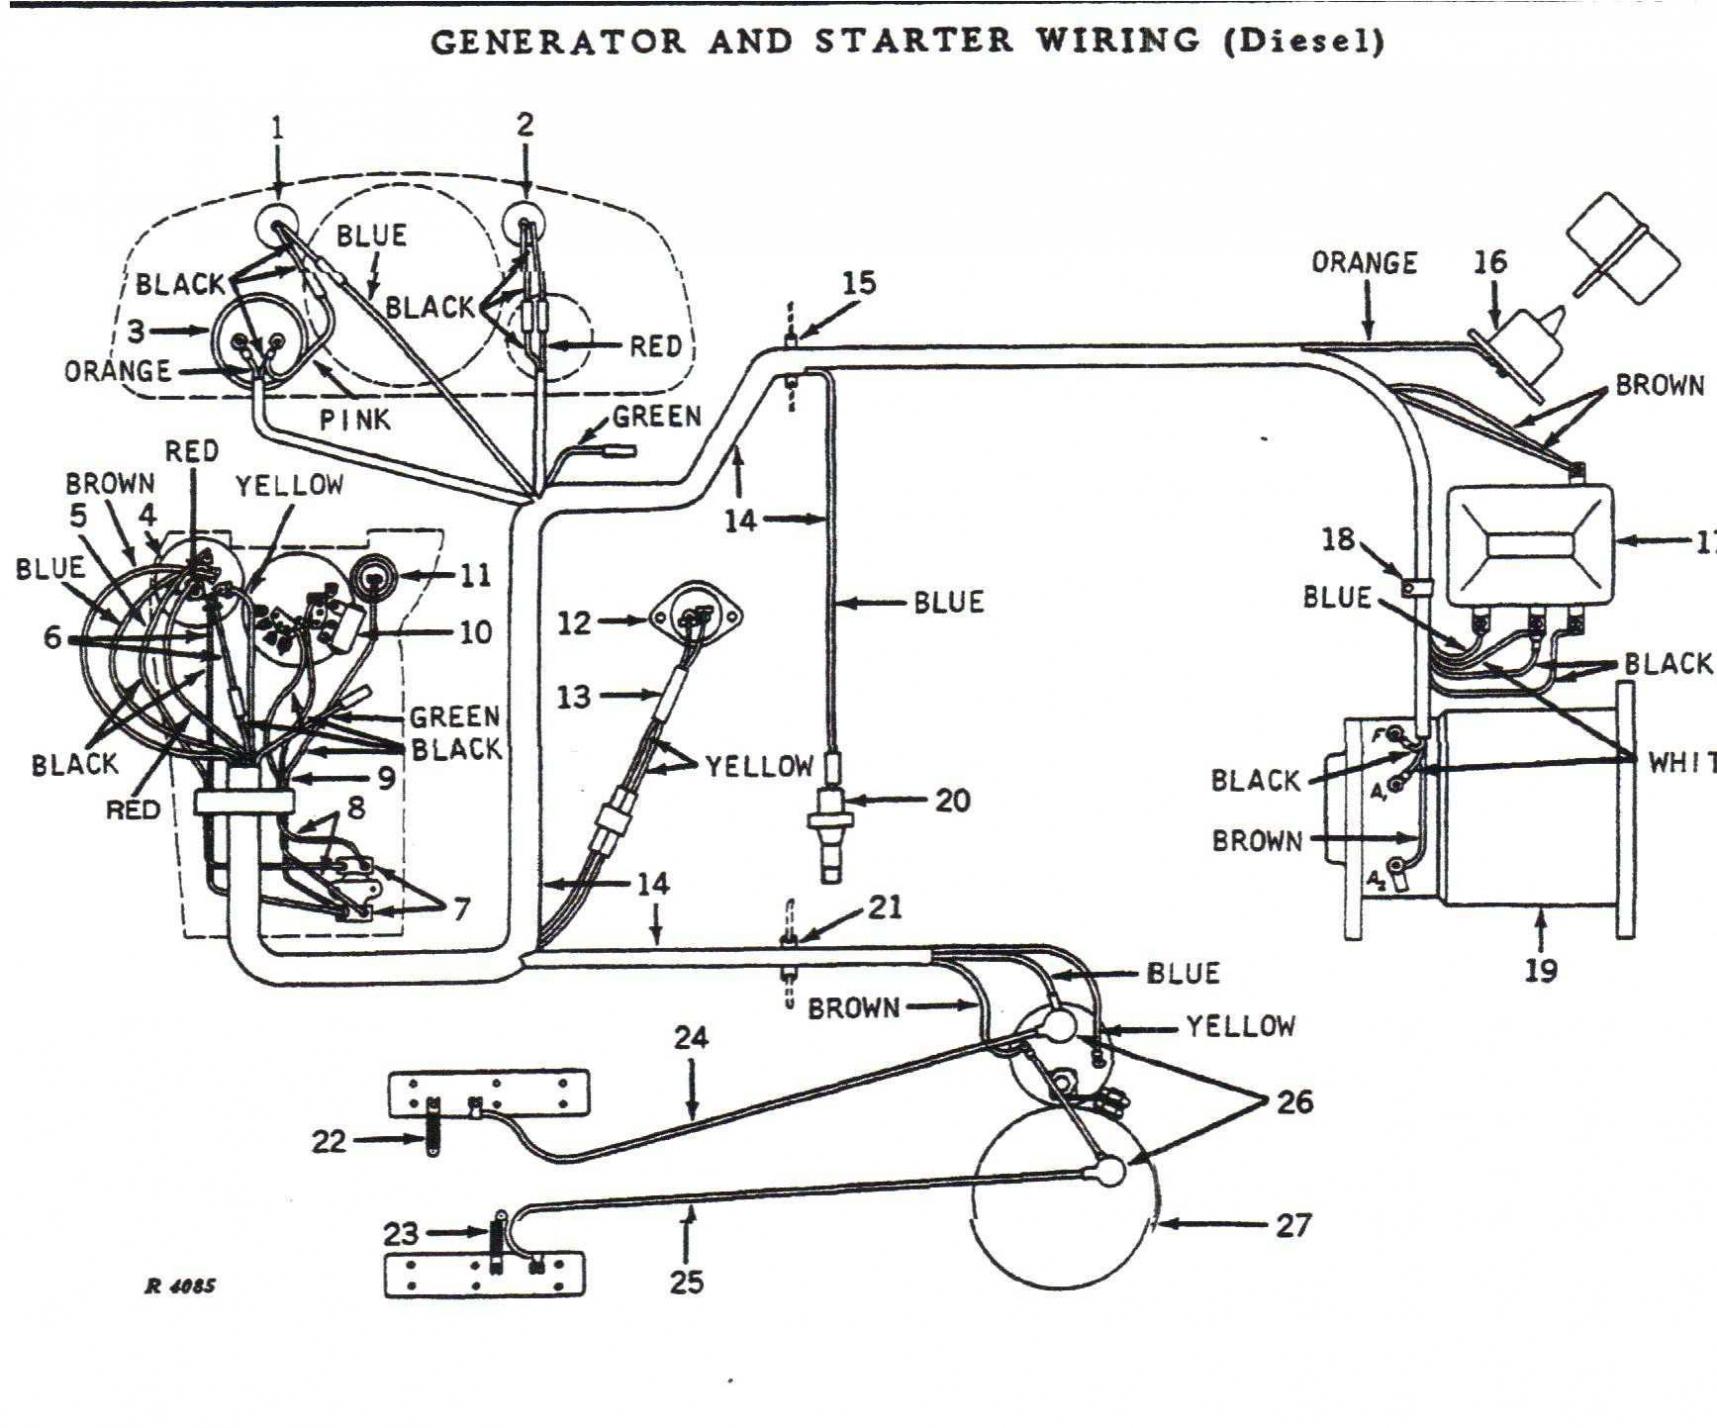 Western Unimount Wiring Diagram Controler   Manual E-Books - Western Plow Solenoid Wiring Diagram